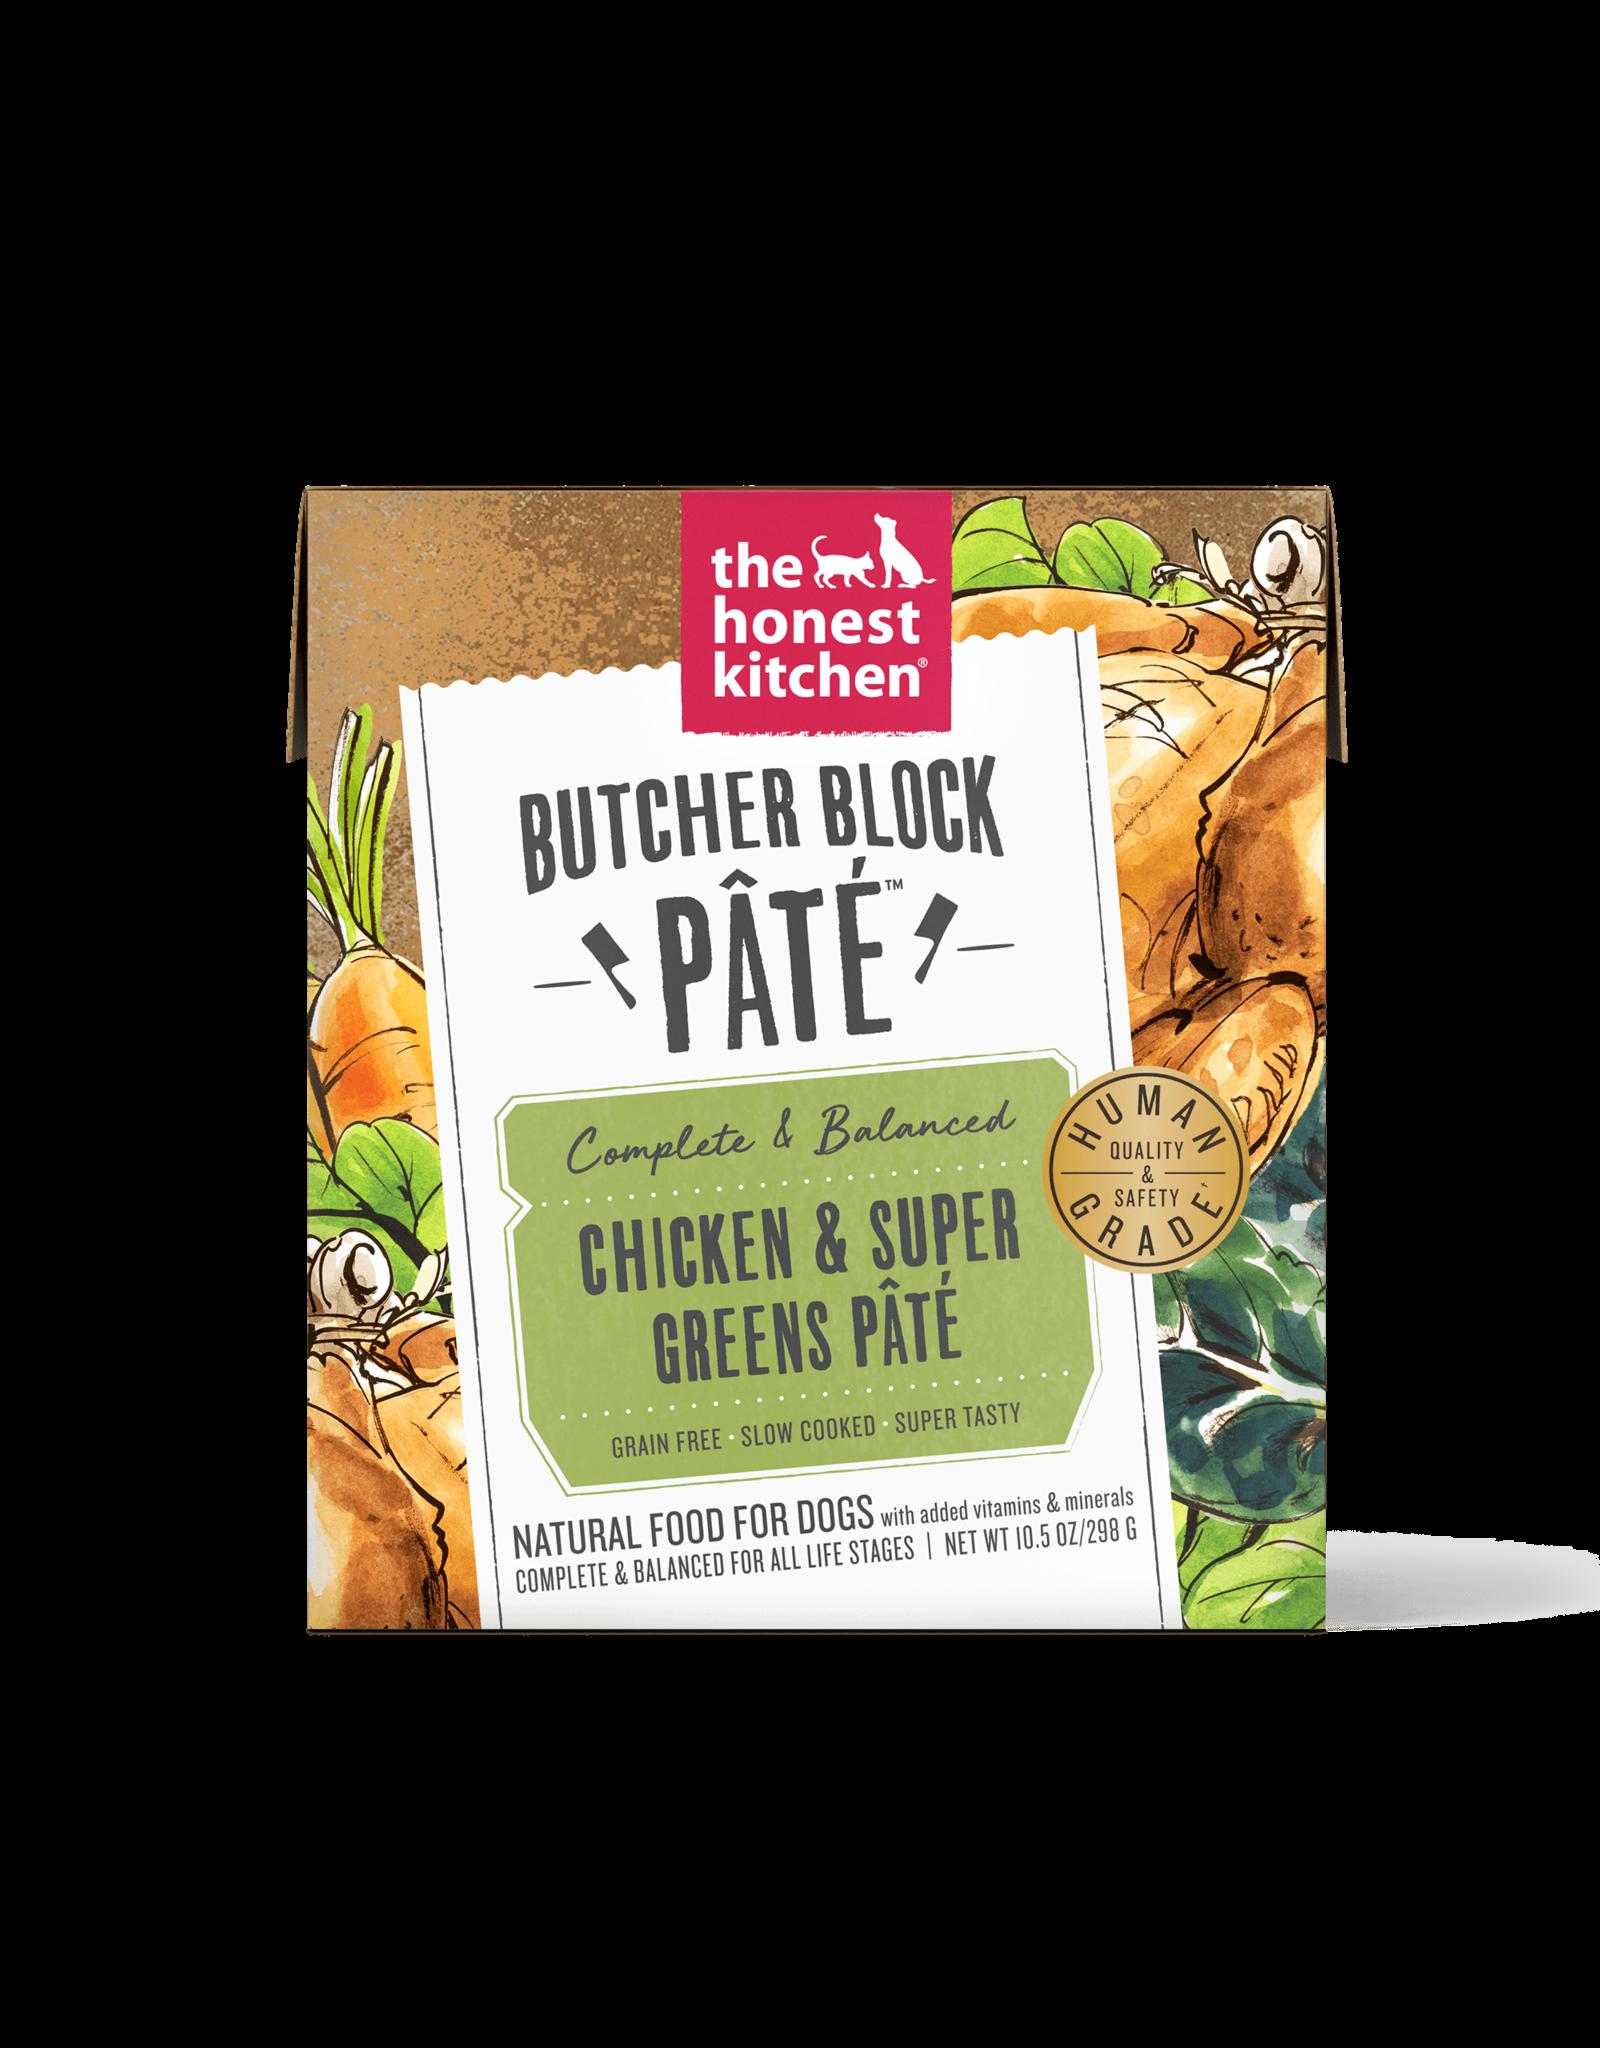 The Honest Kitchen THE HONEST KITCHEN BUTCHER BLOCK PÂTÉ CHICKEN & SUPER GREENS PÂTÉ 10.5OZ